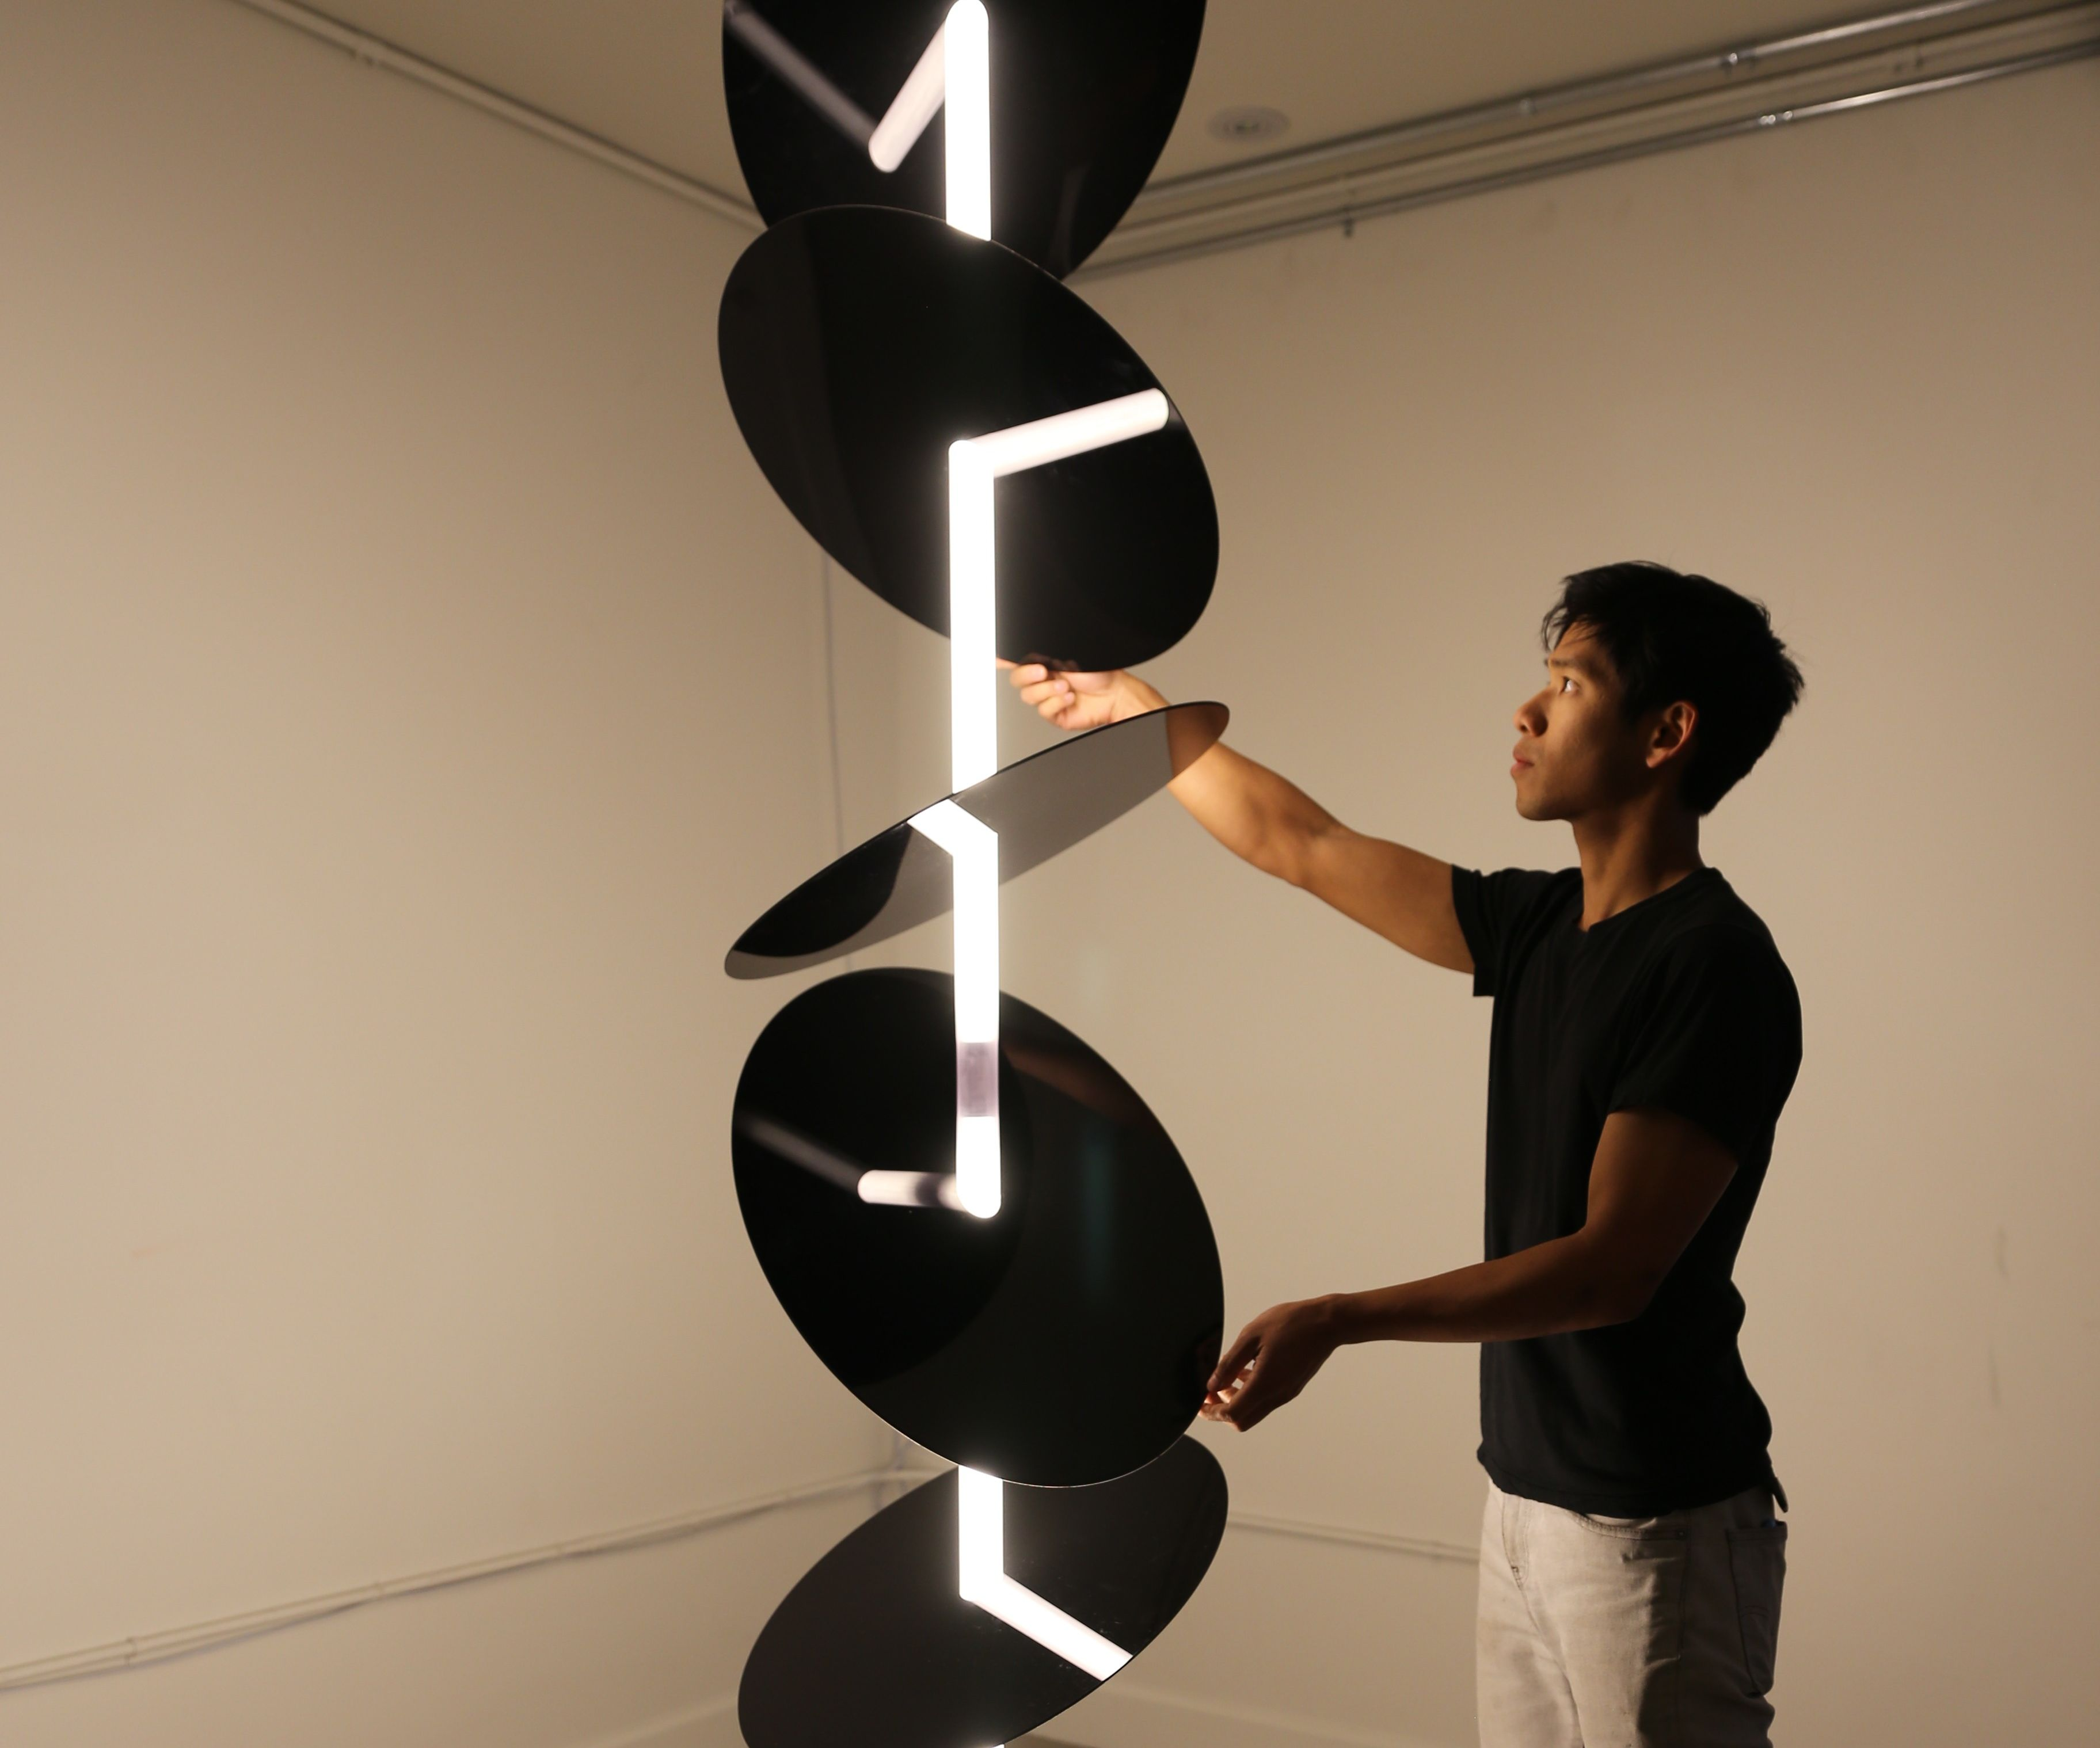 Course Through: a kinetic sculpture